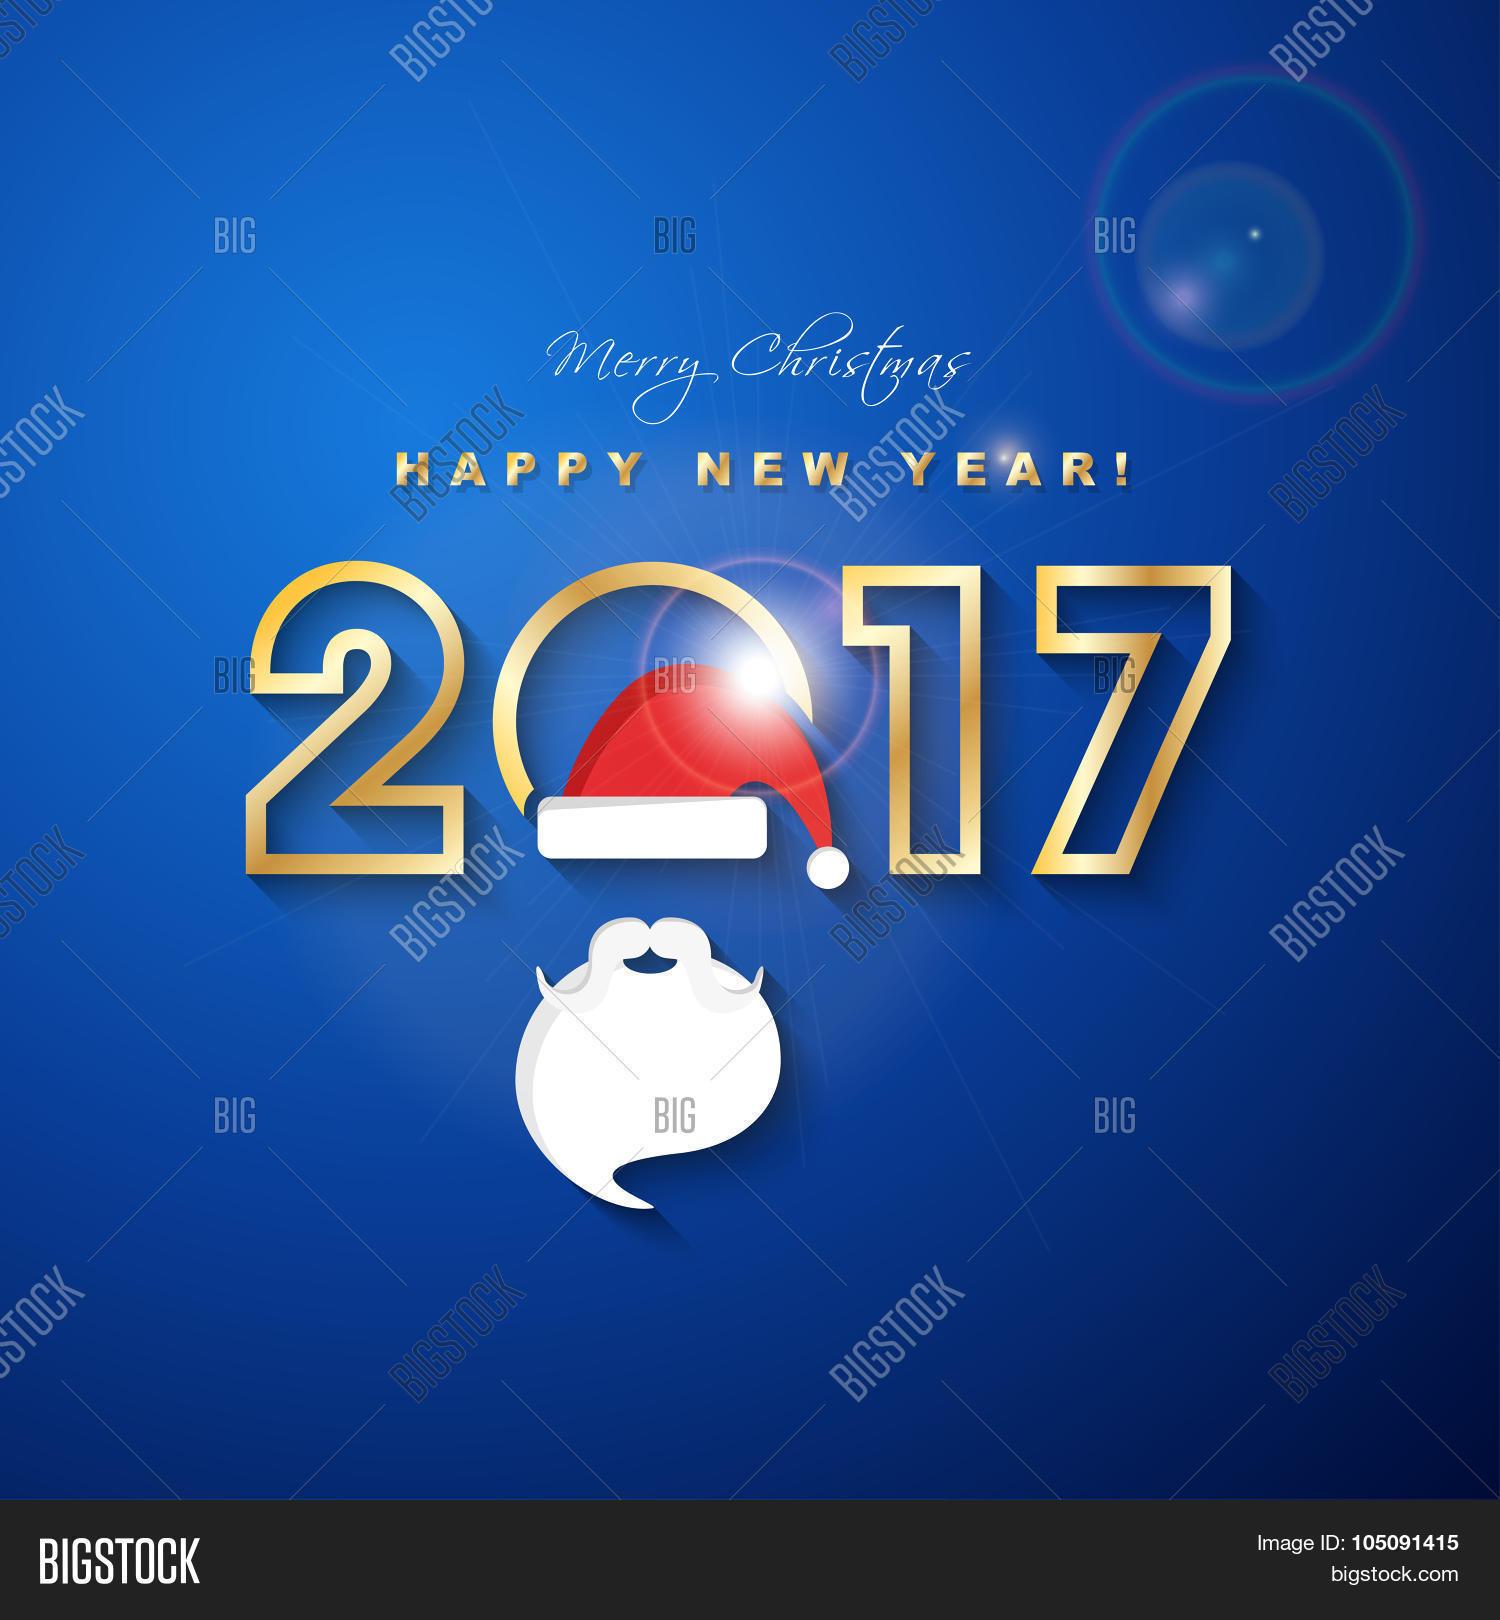 2017 Merry Christmas Vector Photo Free Trial Bigstock